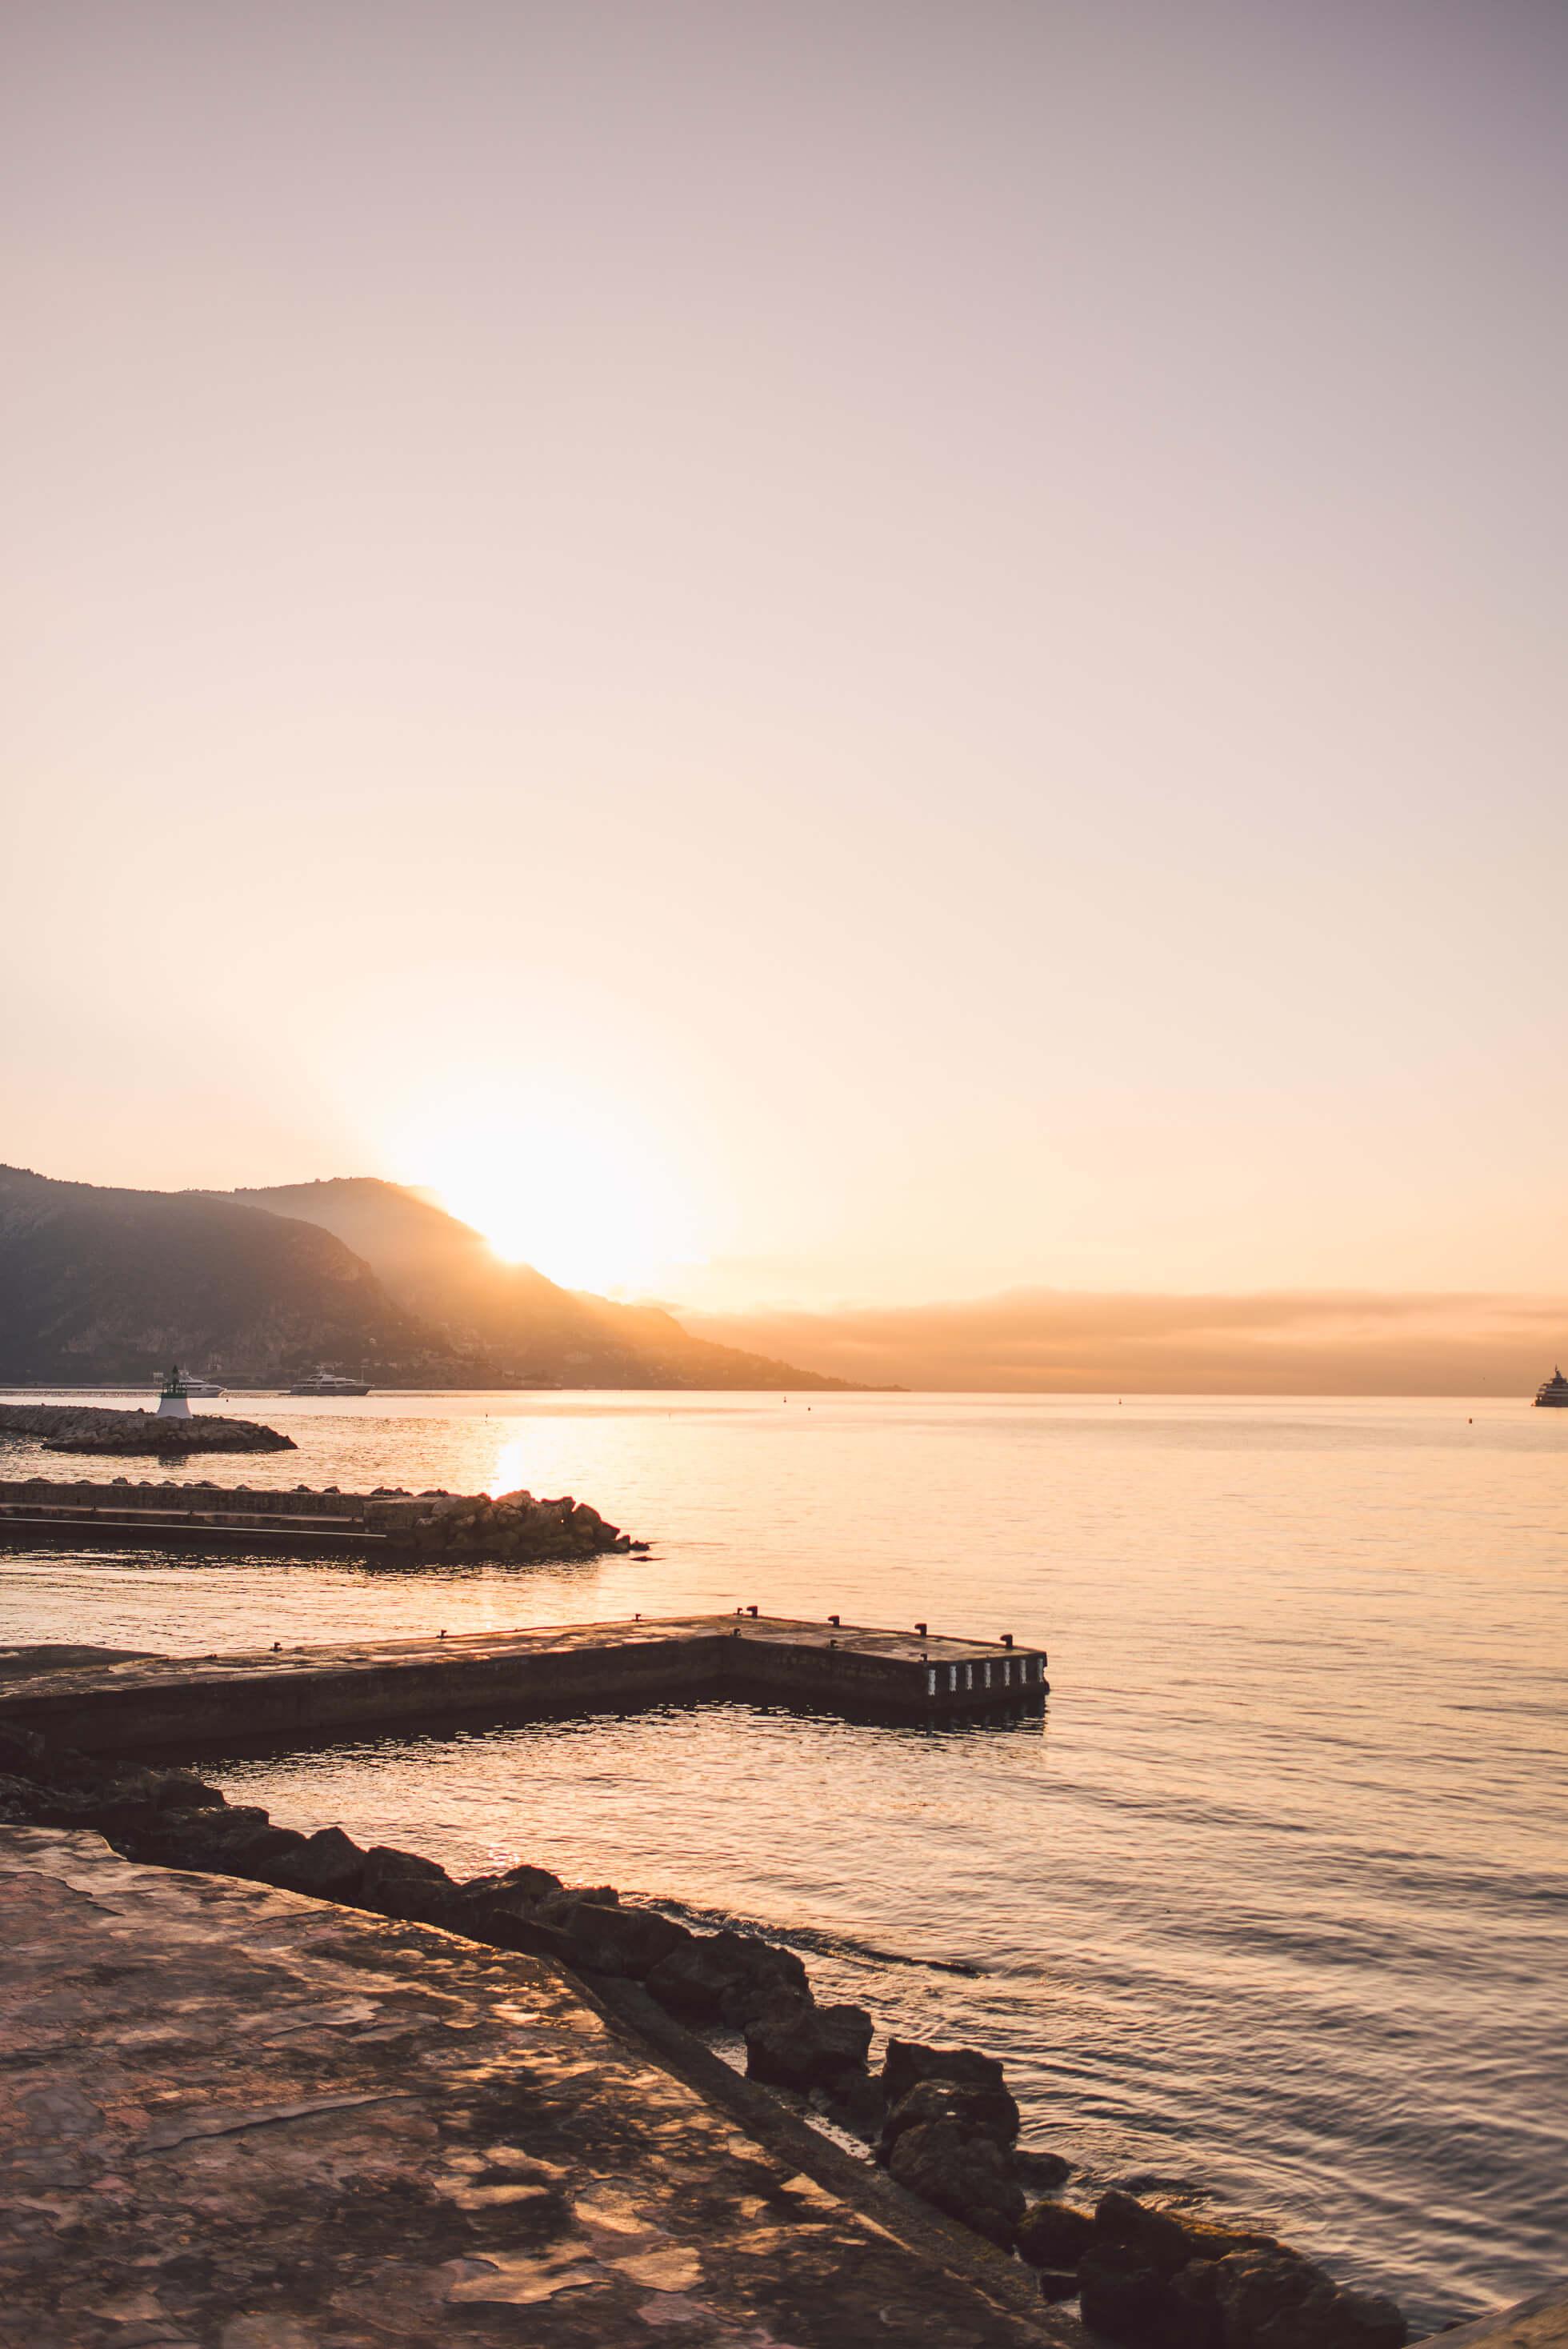 janni-deler-sunrise-berluganDSC_5821